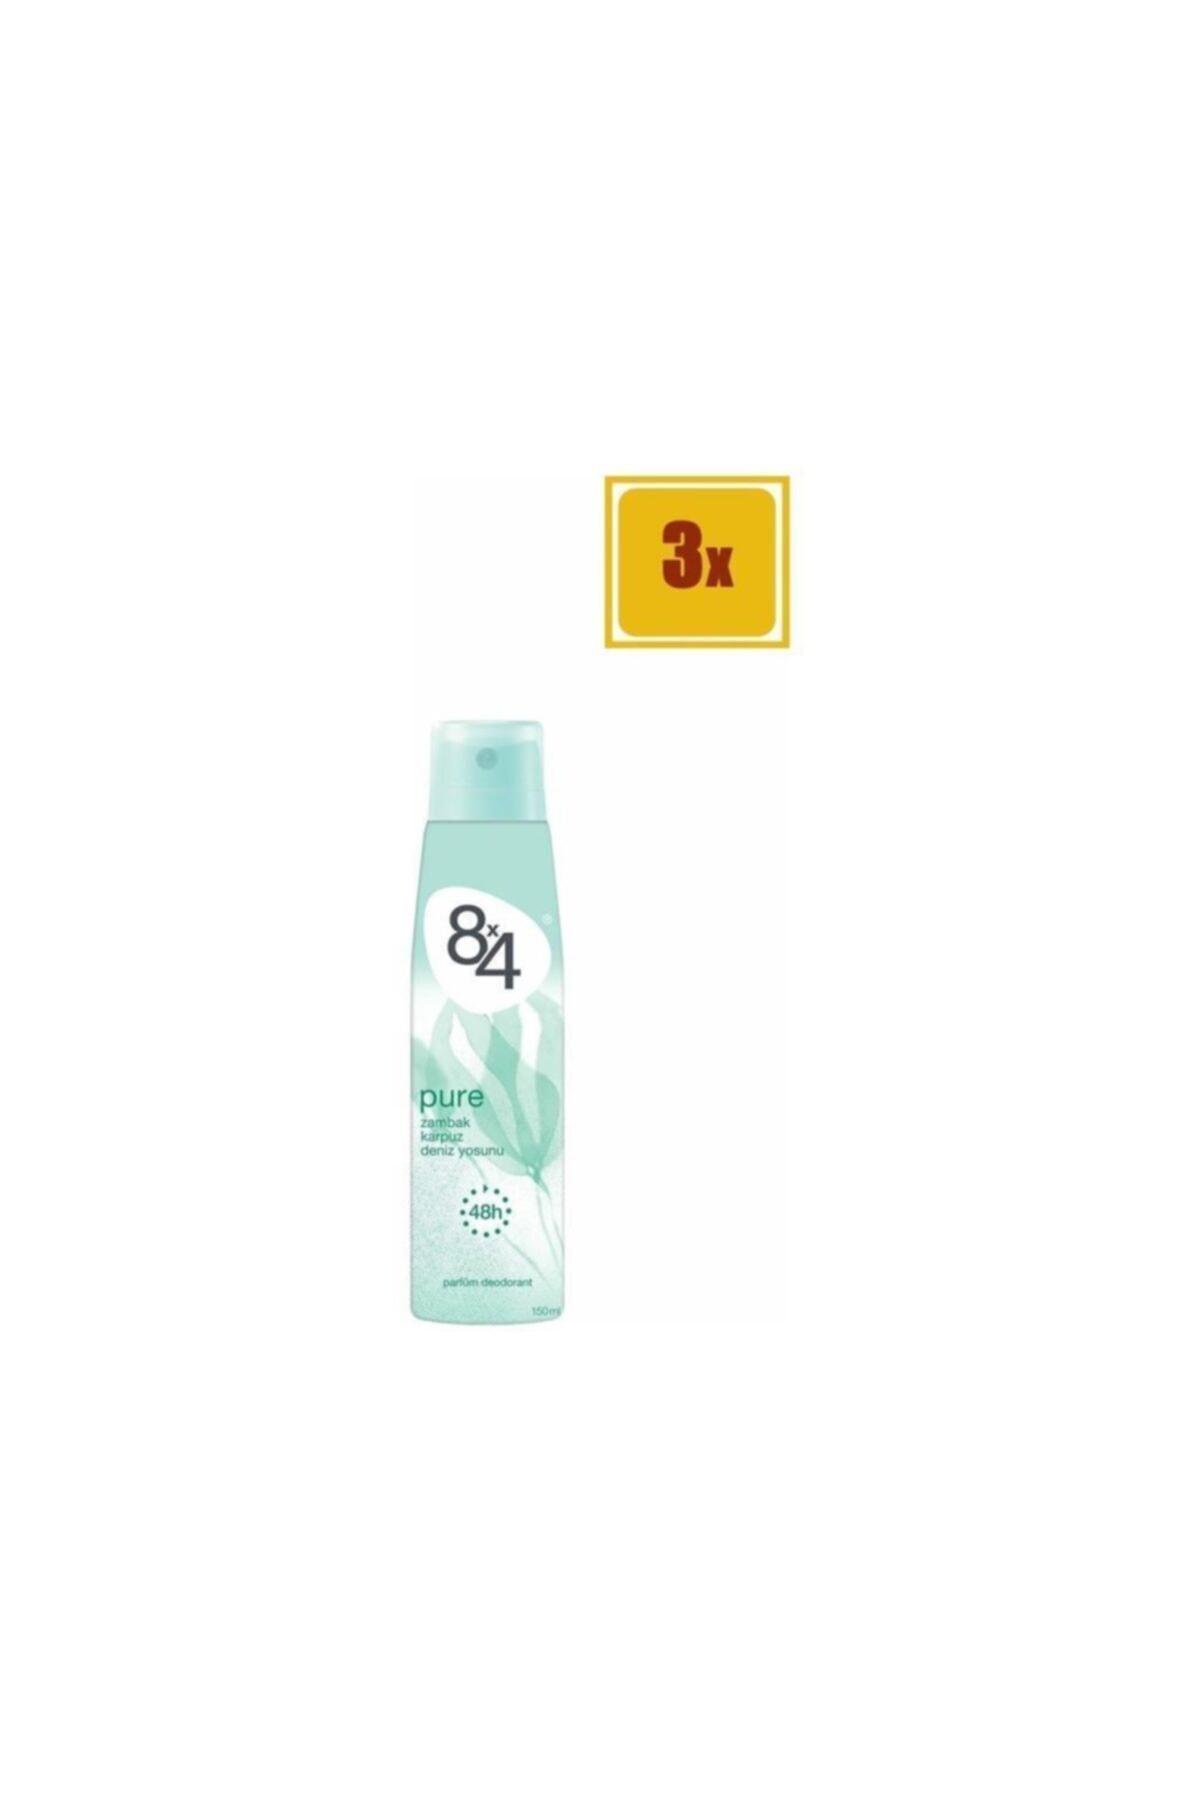 8x4 Pure Sprey Deodorant 150 ml X 3 Adet 1